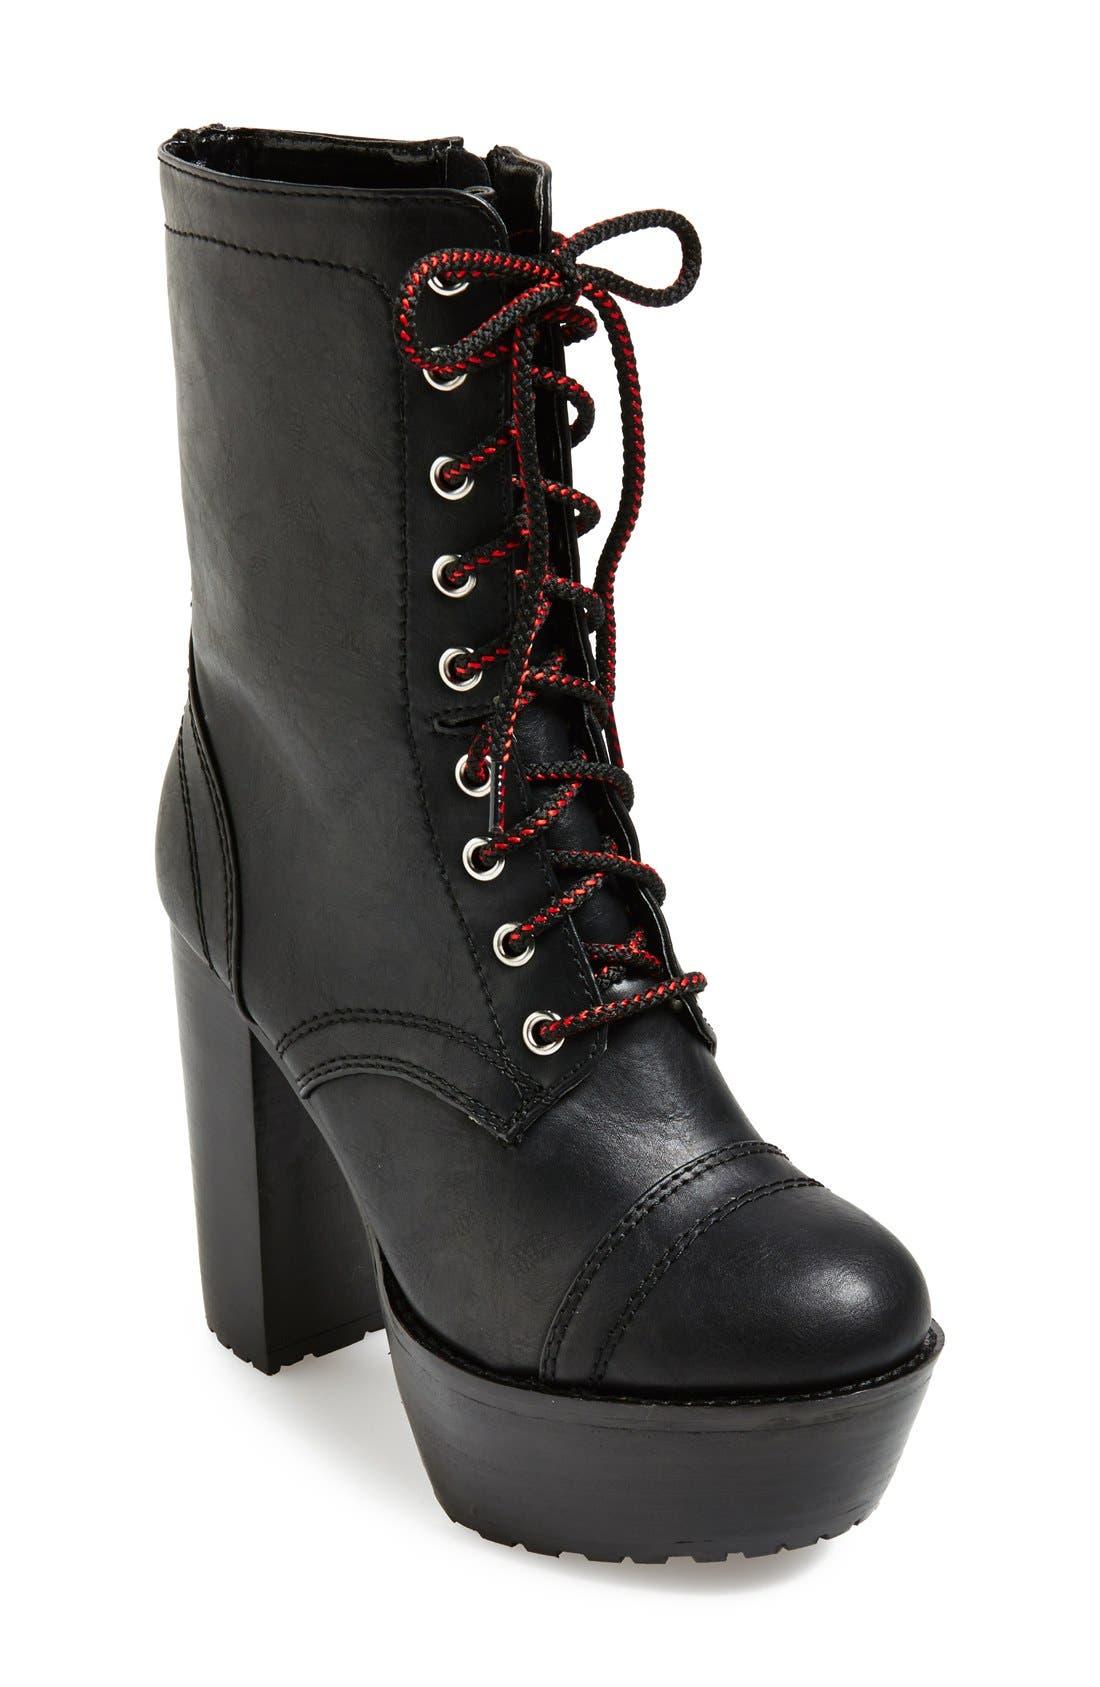 Alternate Image 1 Selected - KENDALL + KYLIE Madden Girl 'Averryy' Platform Mid Boot (Women)